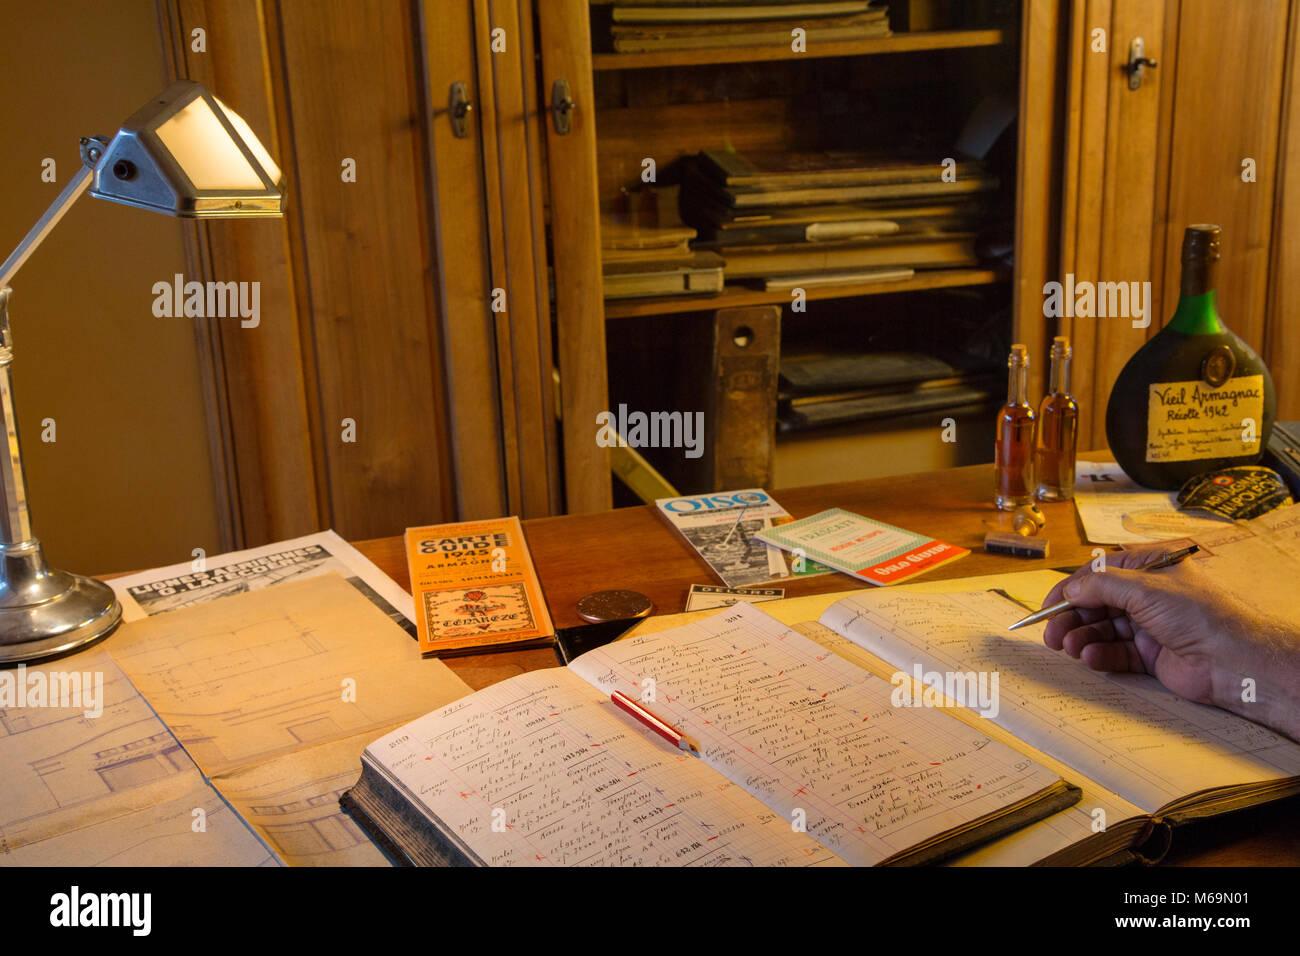 Armagnac Delord cellar, Lannepax. Le Gers Department, New Aquitaine, Midi Pyerenees. France Europe - Stock Image